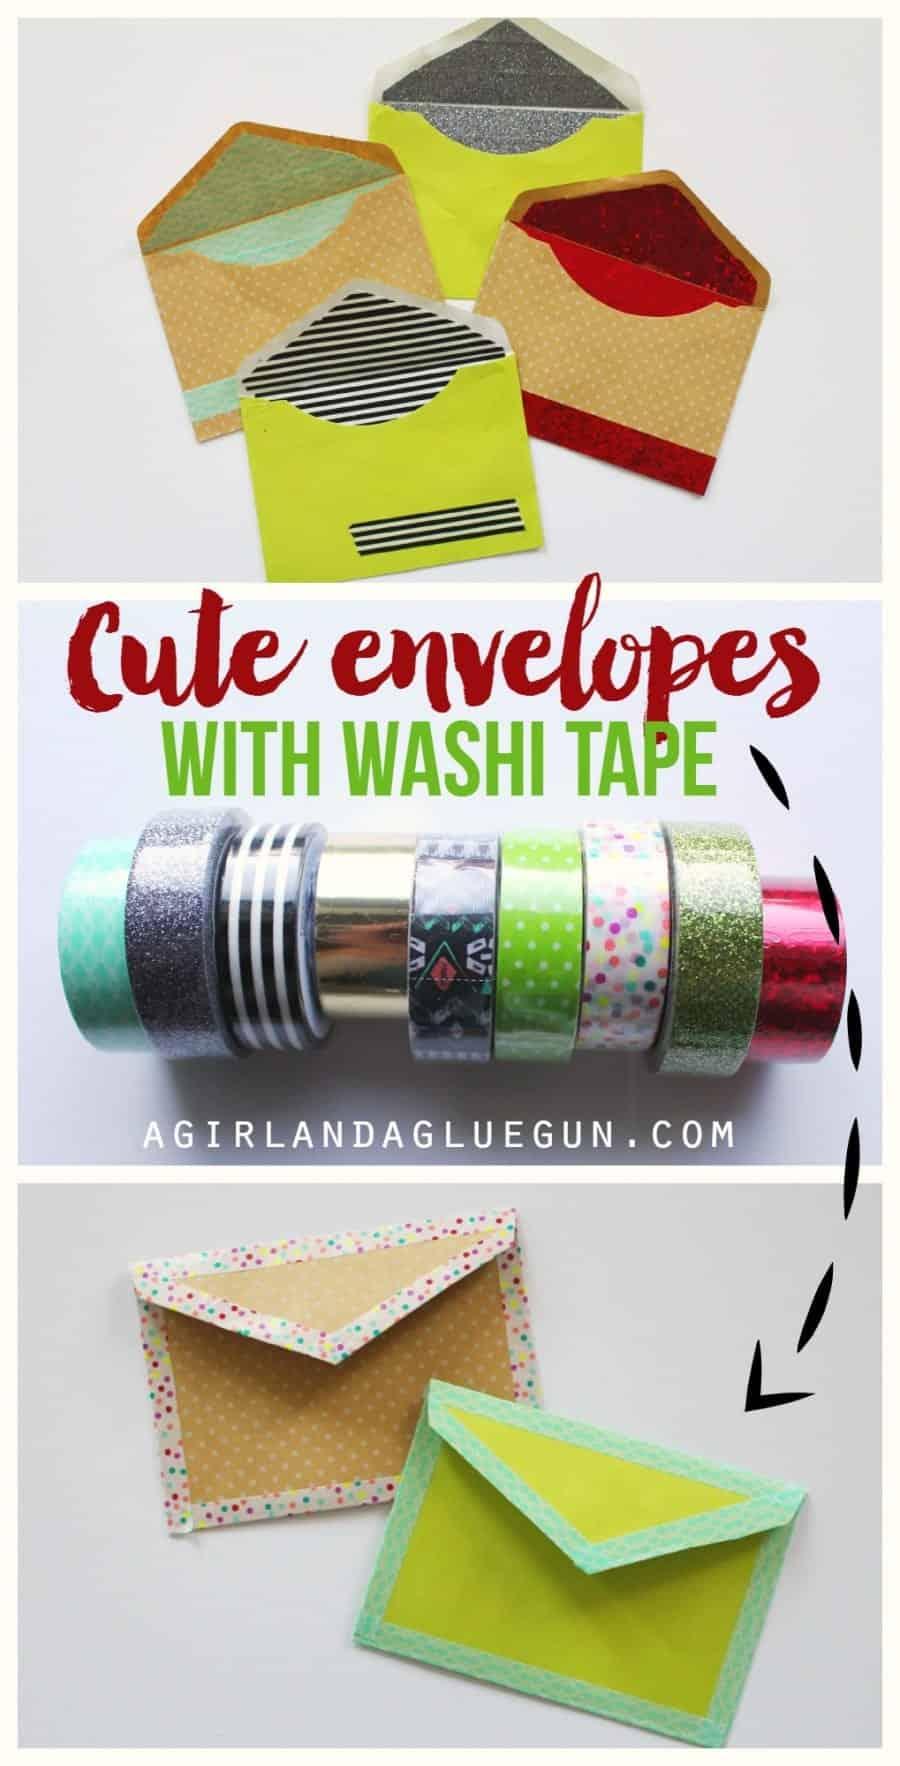 make adorable envelopes with washi tape